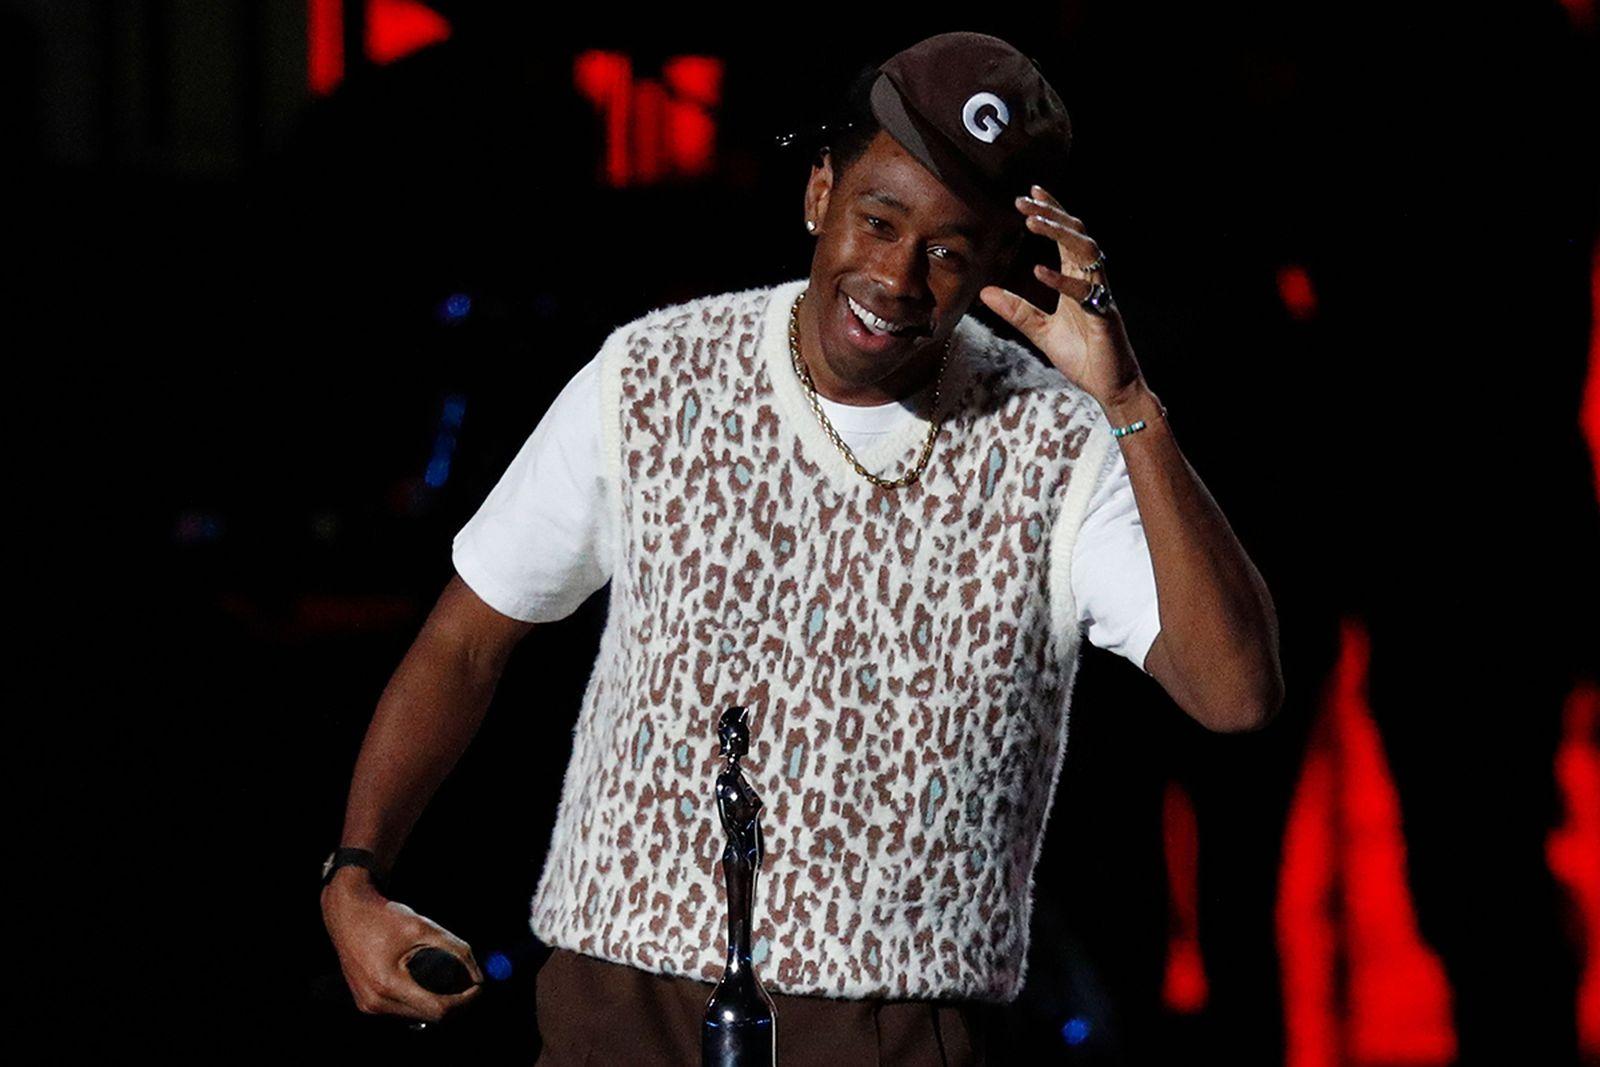 Tyler the Creator smiling GOLF WANG hat